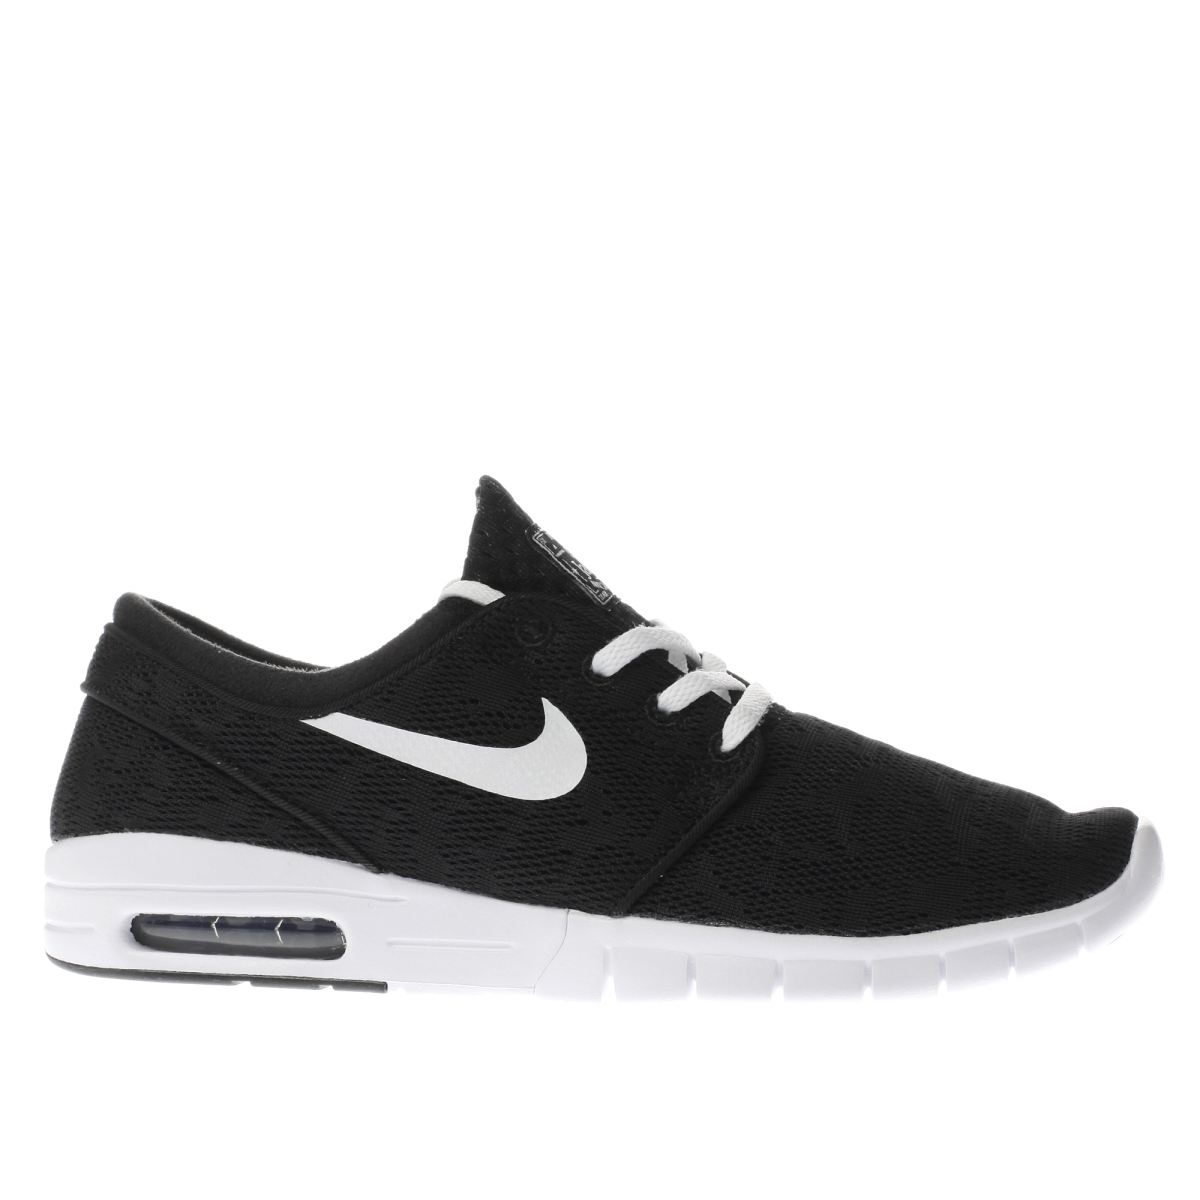 nike sb black & white stefan janoski max trainers